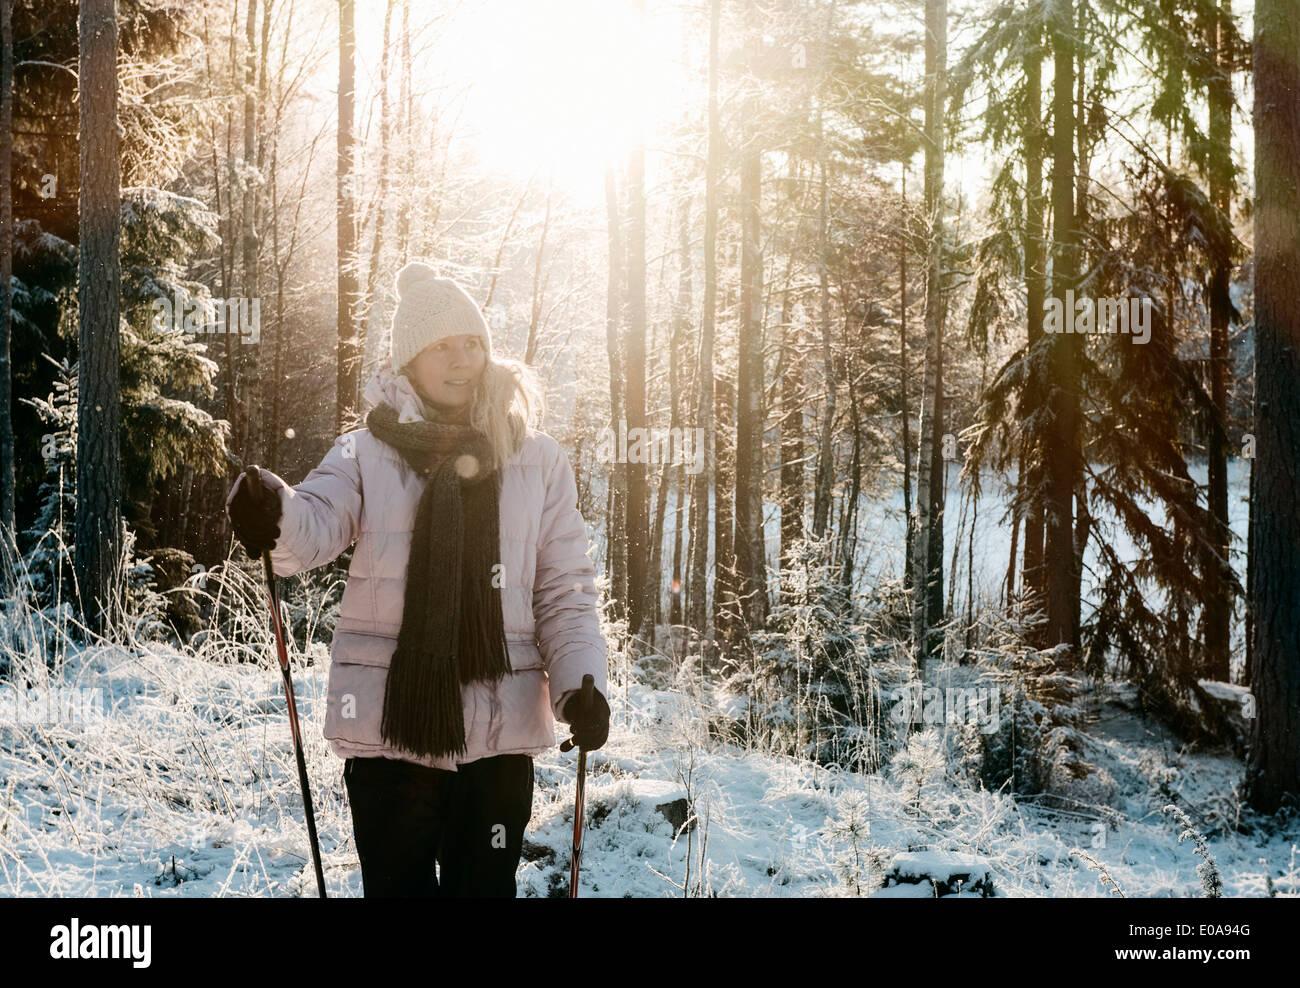 Metà donna adulta nordic walking in coperta di neve forest Immagini Stock